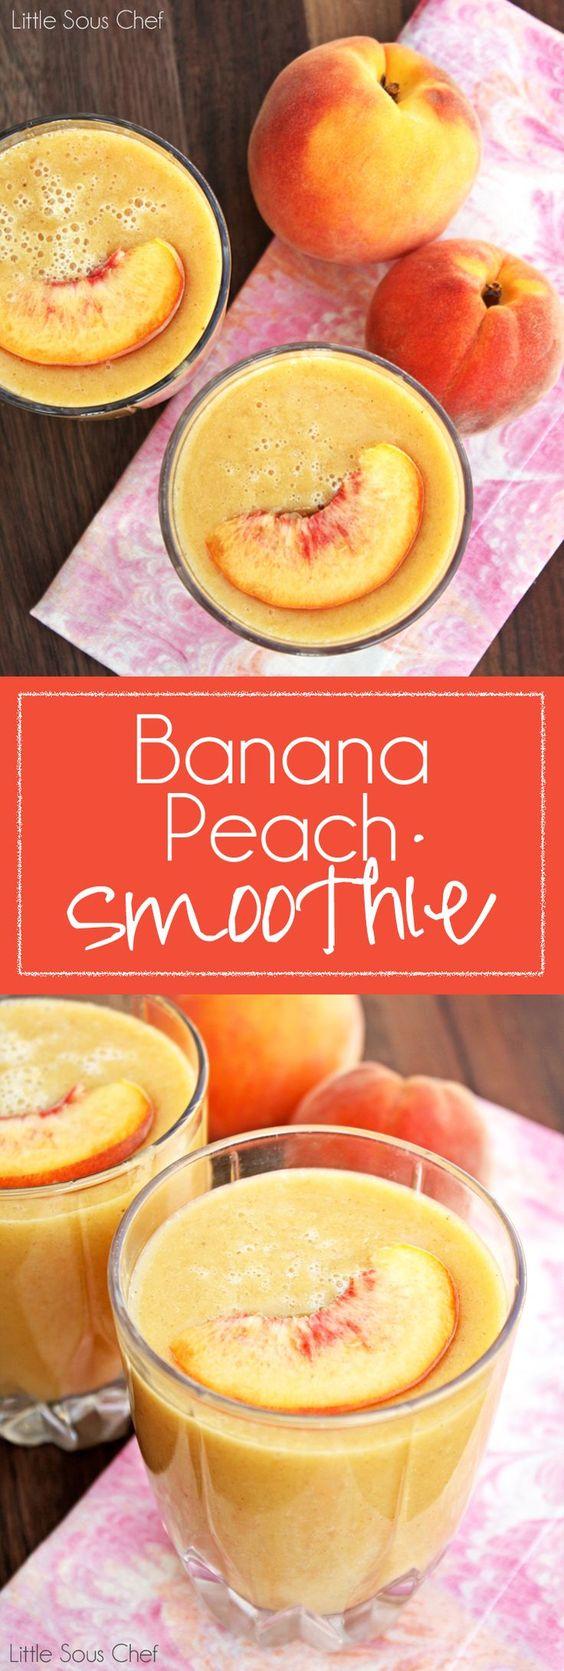 Easy Banana Peach Smoothie | Recipe | Smoothie, Peaches and Bananas